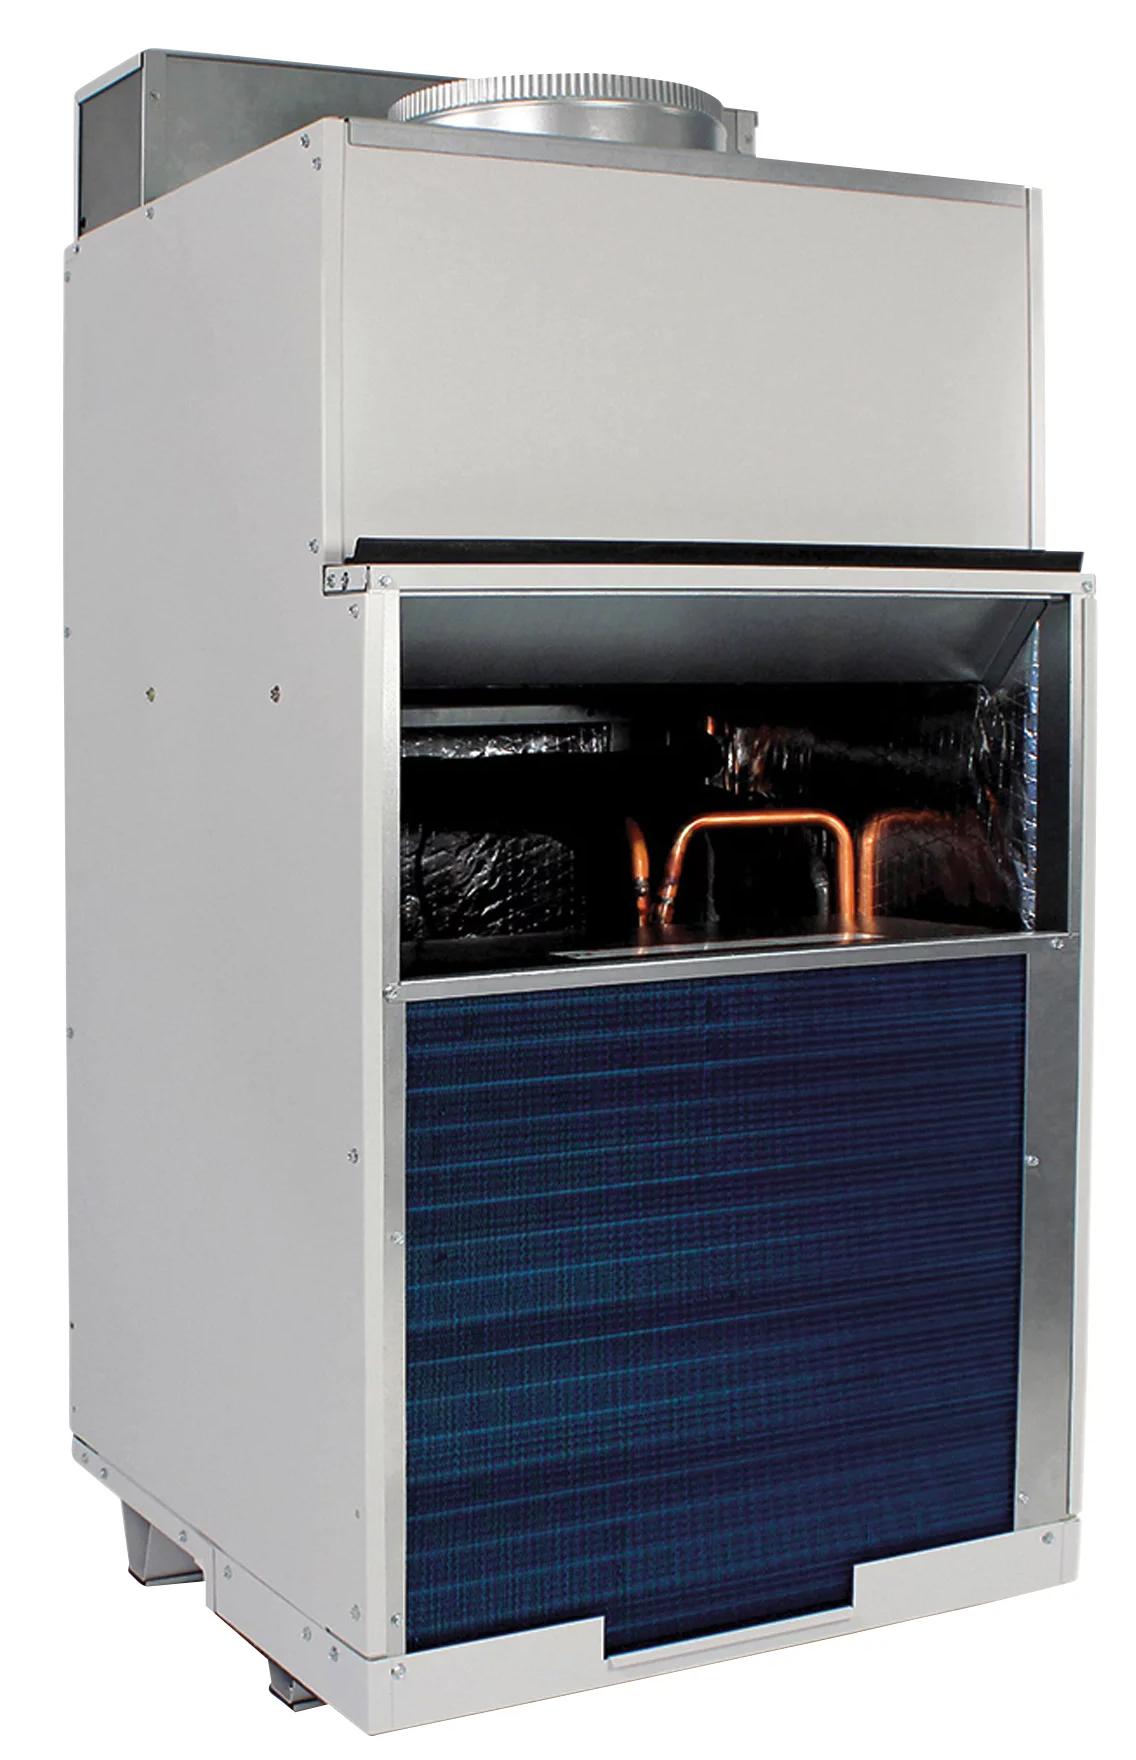 Amana AVH184H35AXXX 18000 BTU Vertical Terminal Air Conditioner with Heat Pump (VTAC) - 265 Volt; 20 Amp